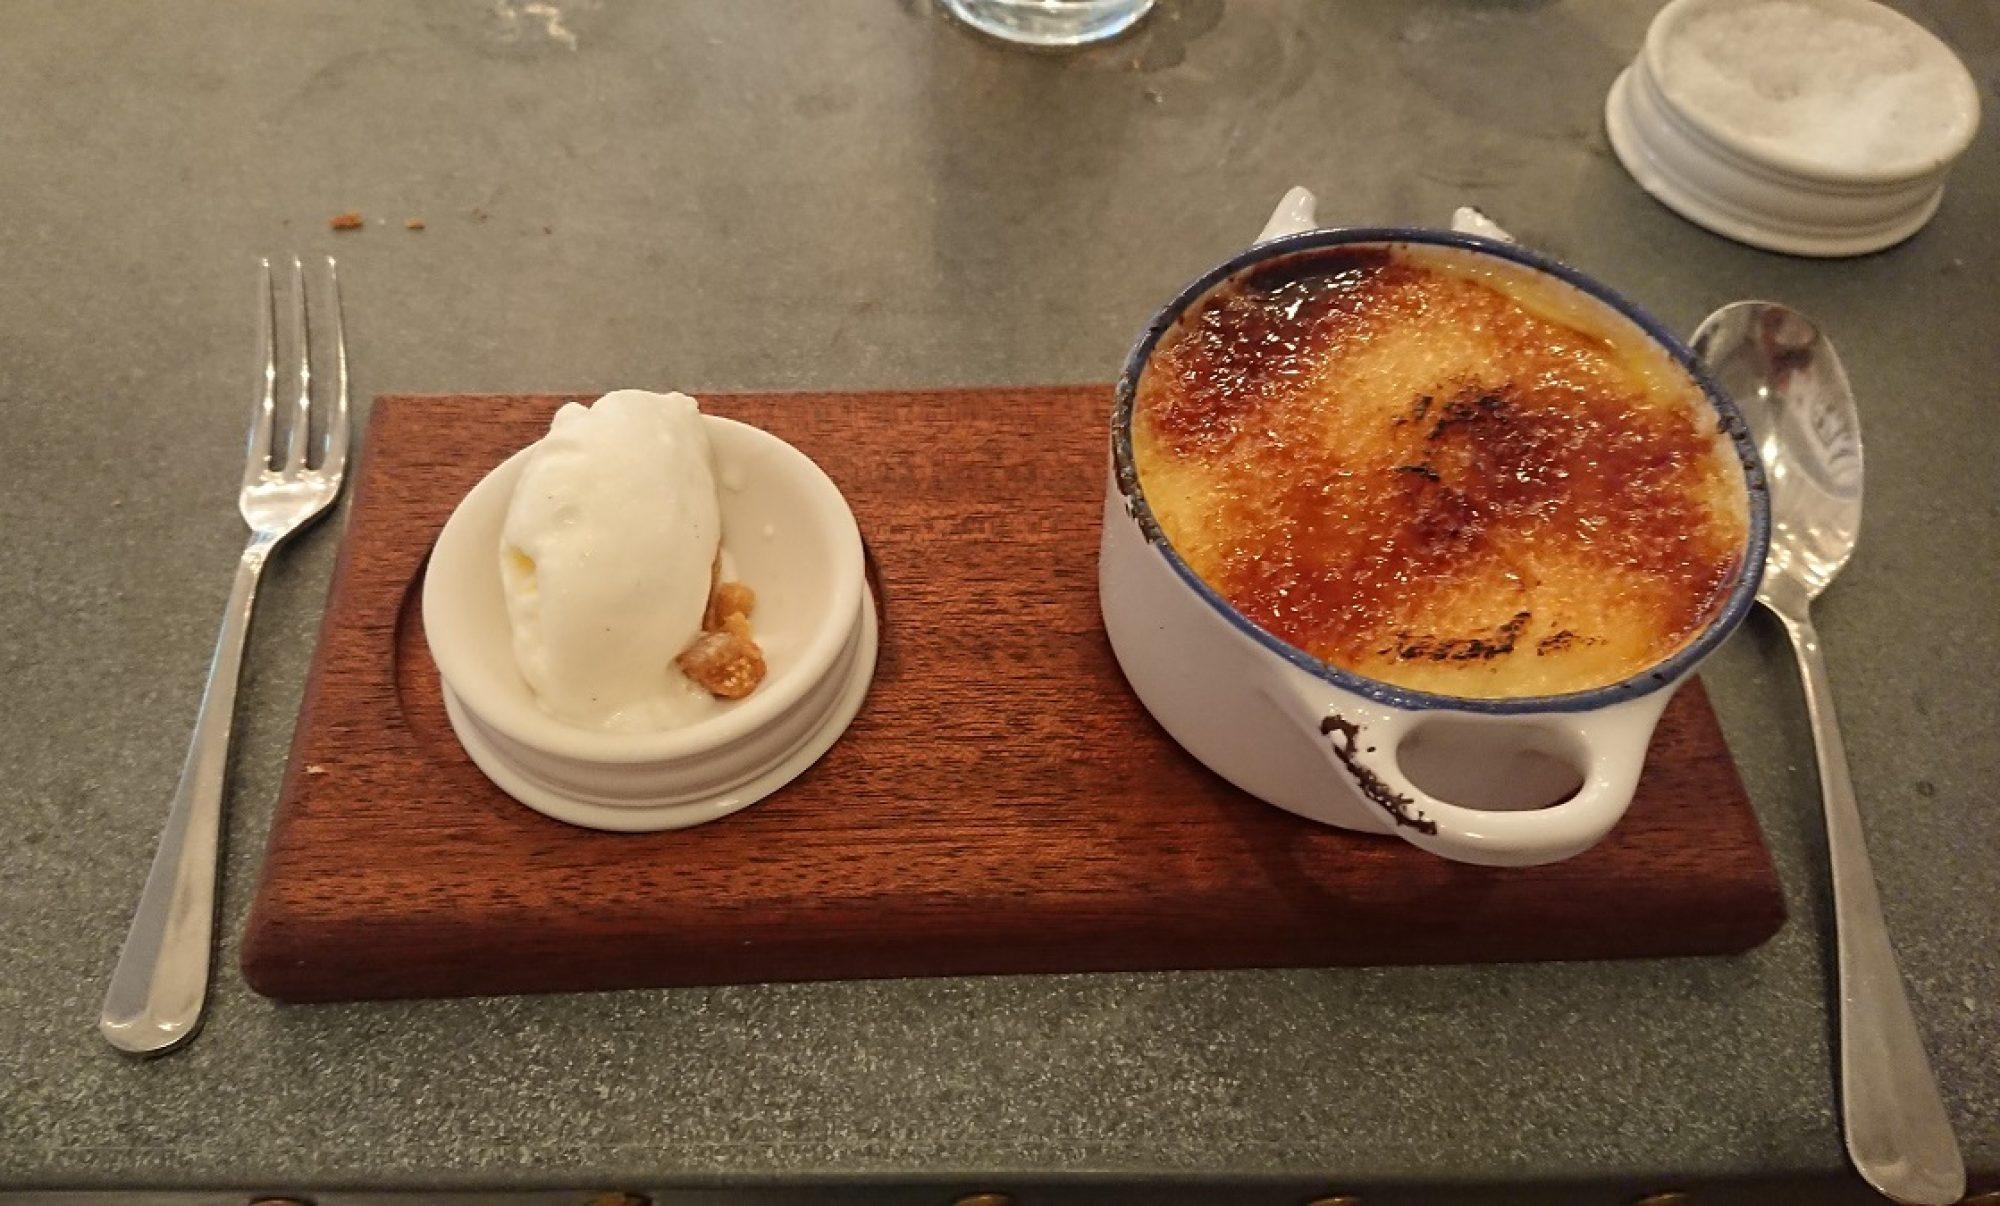 Just the Dessert